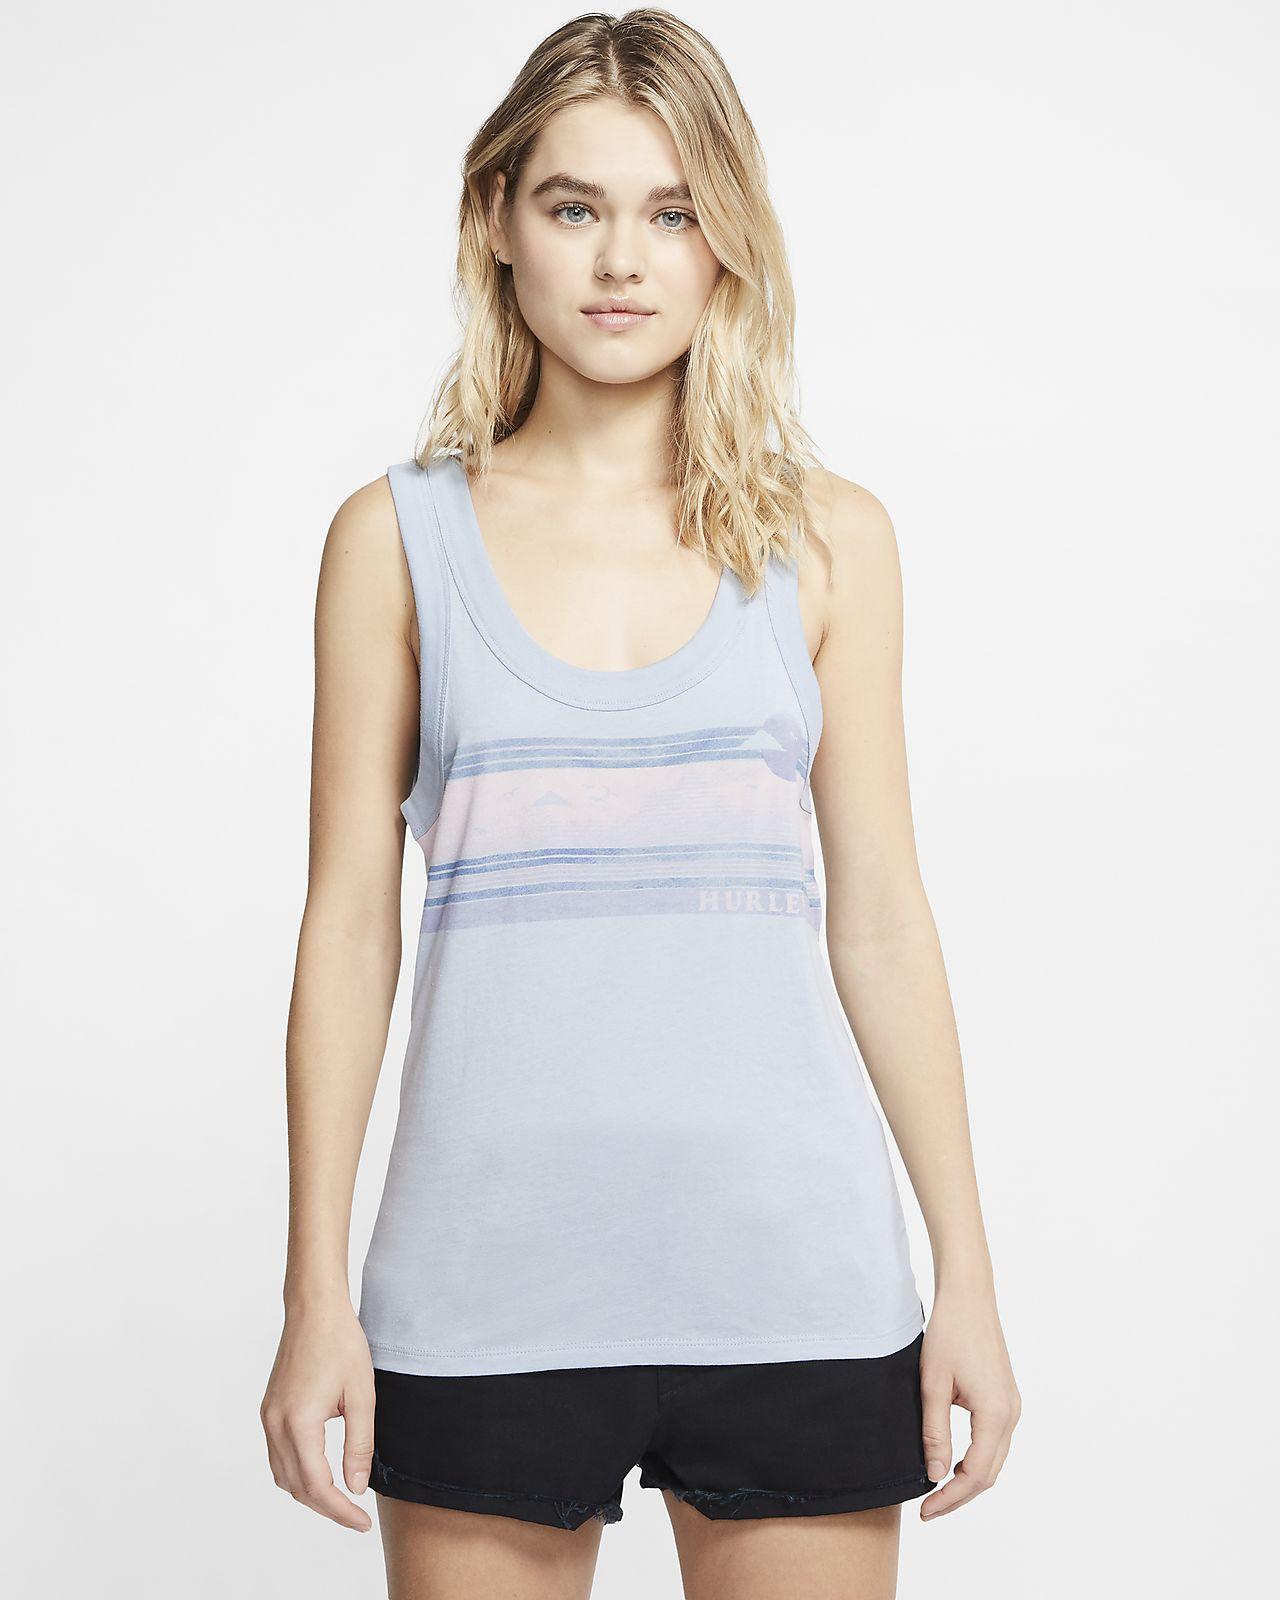 Hurley Womens Scenic Stripes Scoop Neck Tank Top